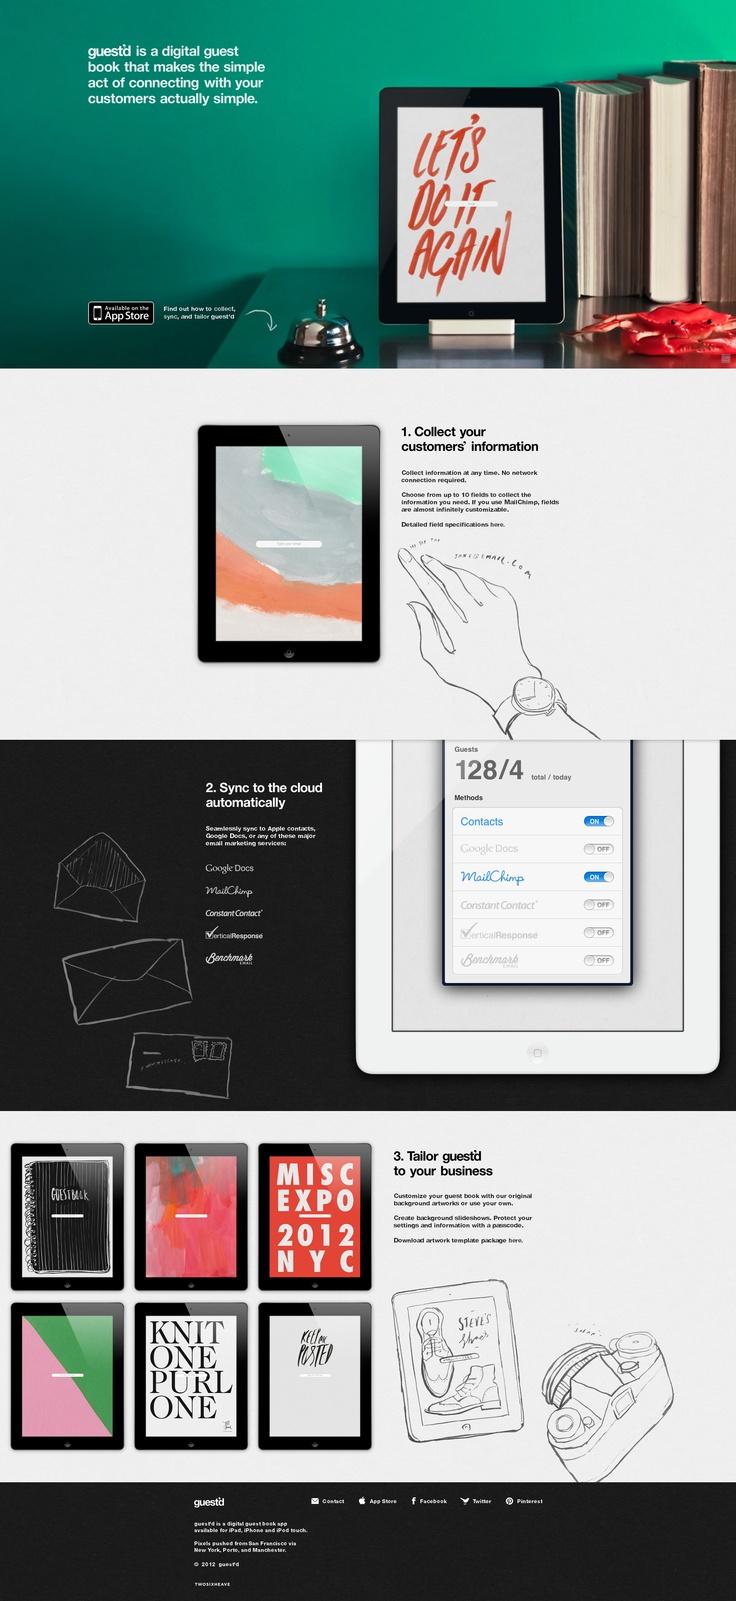 Web design for the Digital Guestbook App